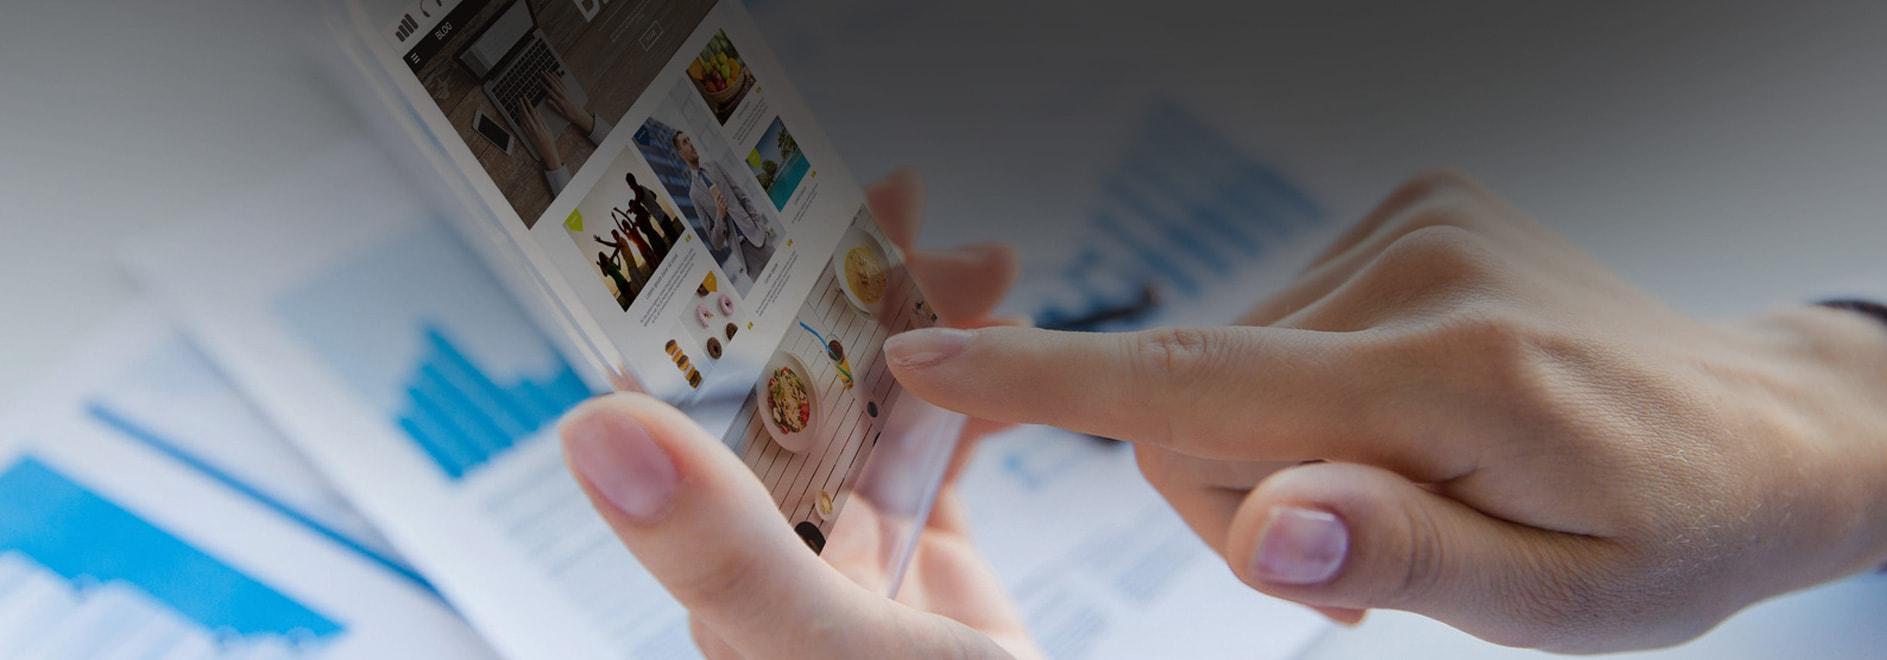 WEB DEVELOPMENT E-COMMERCE WEBSITES